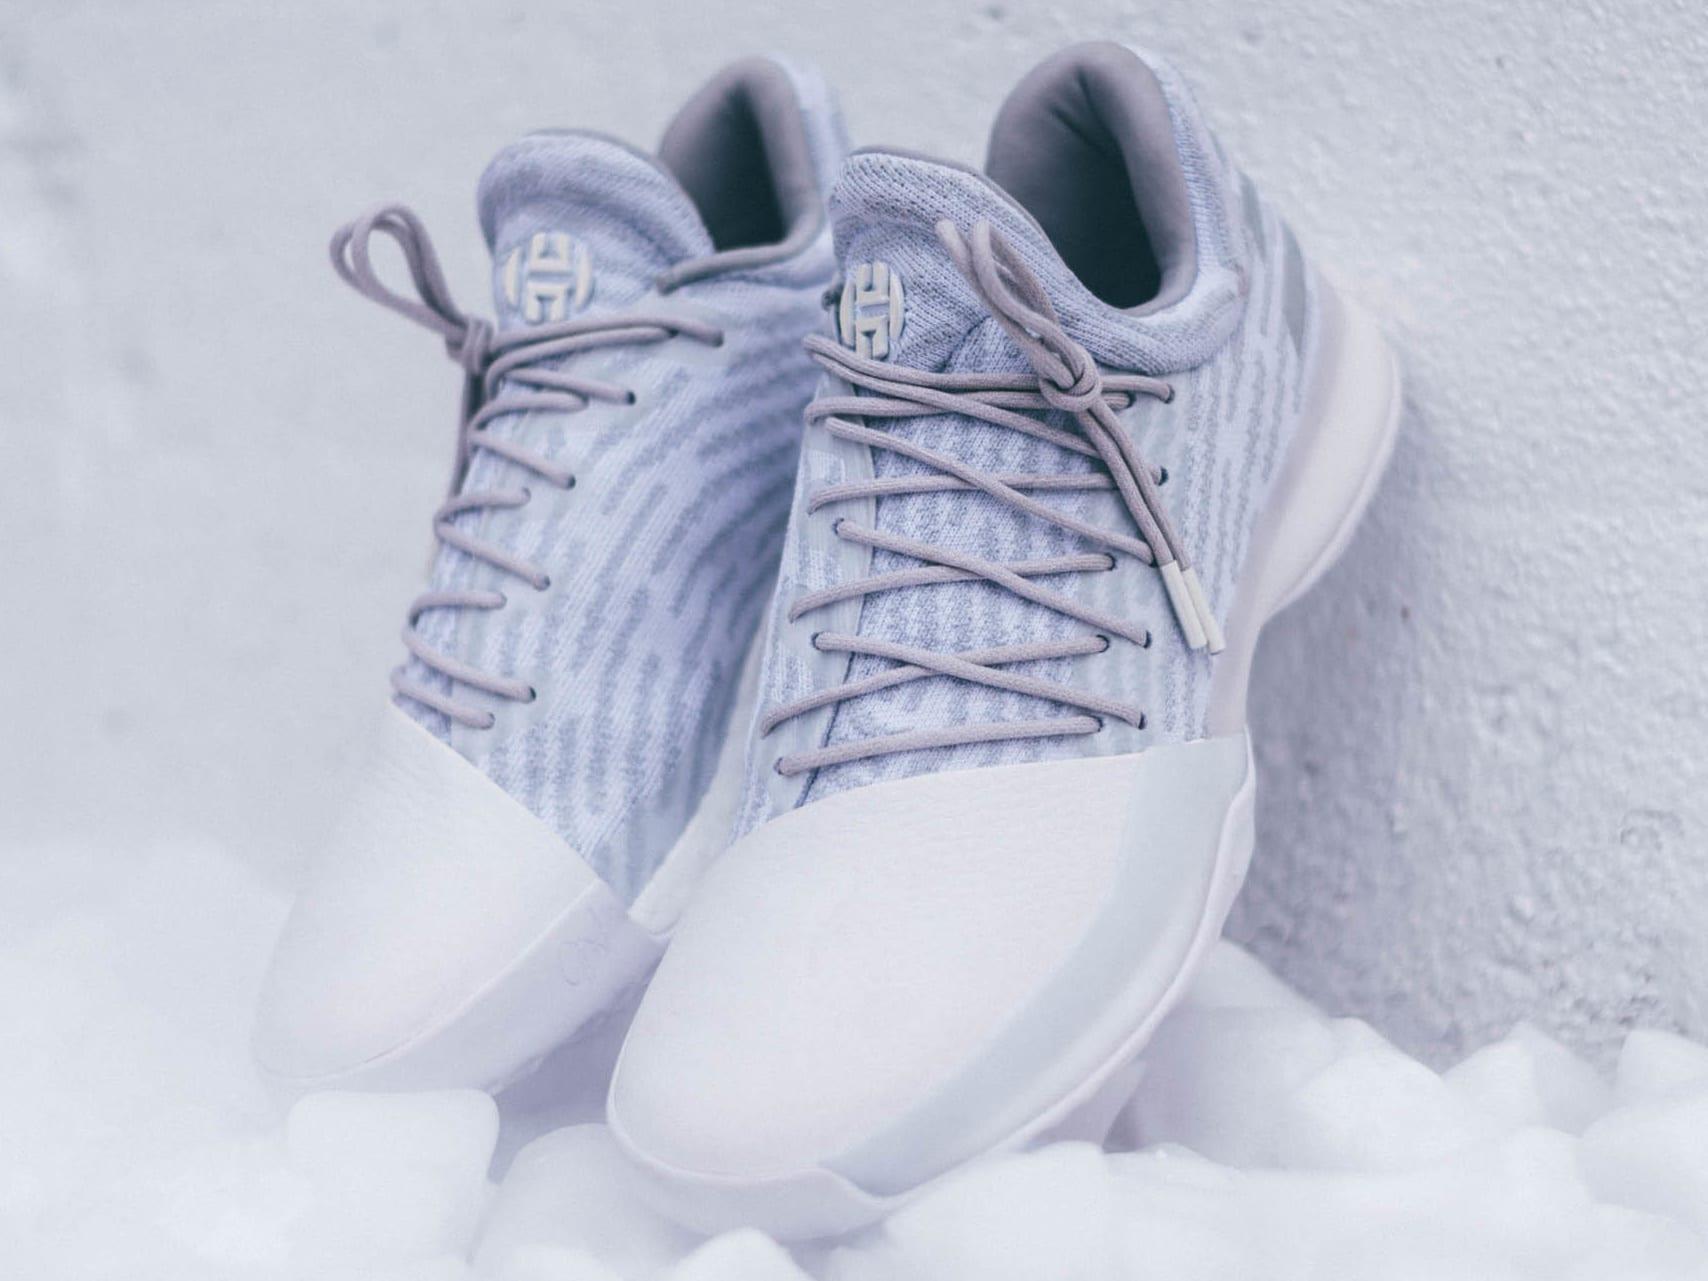 sale retailer 19dfe c6e61 Adidas Harden Vol. 1